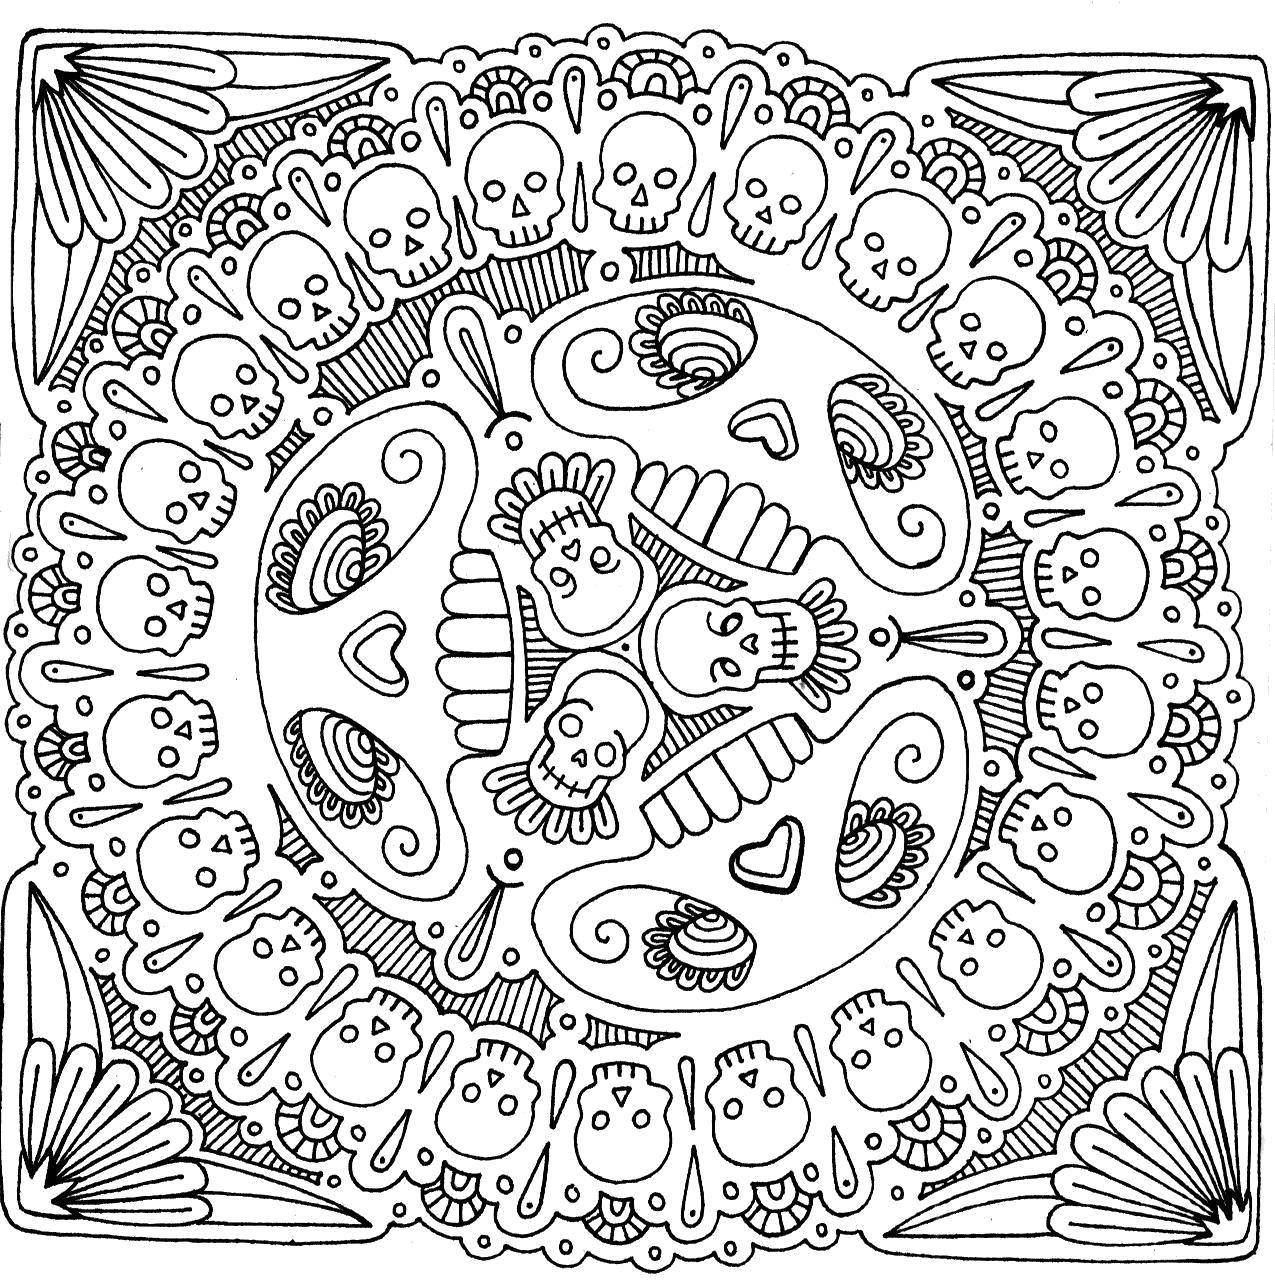 Раскраски эмблема, Раскраска Эмблема хогвартса Гарри Поттер.